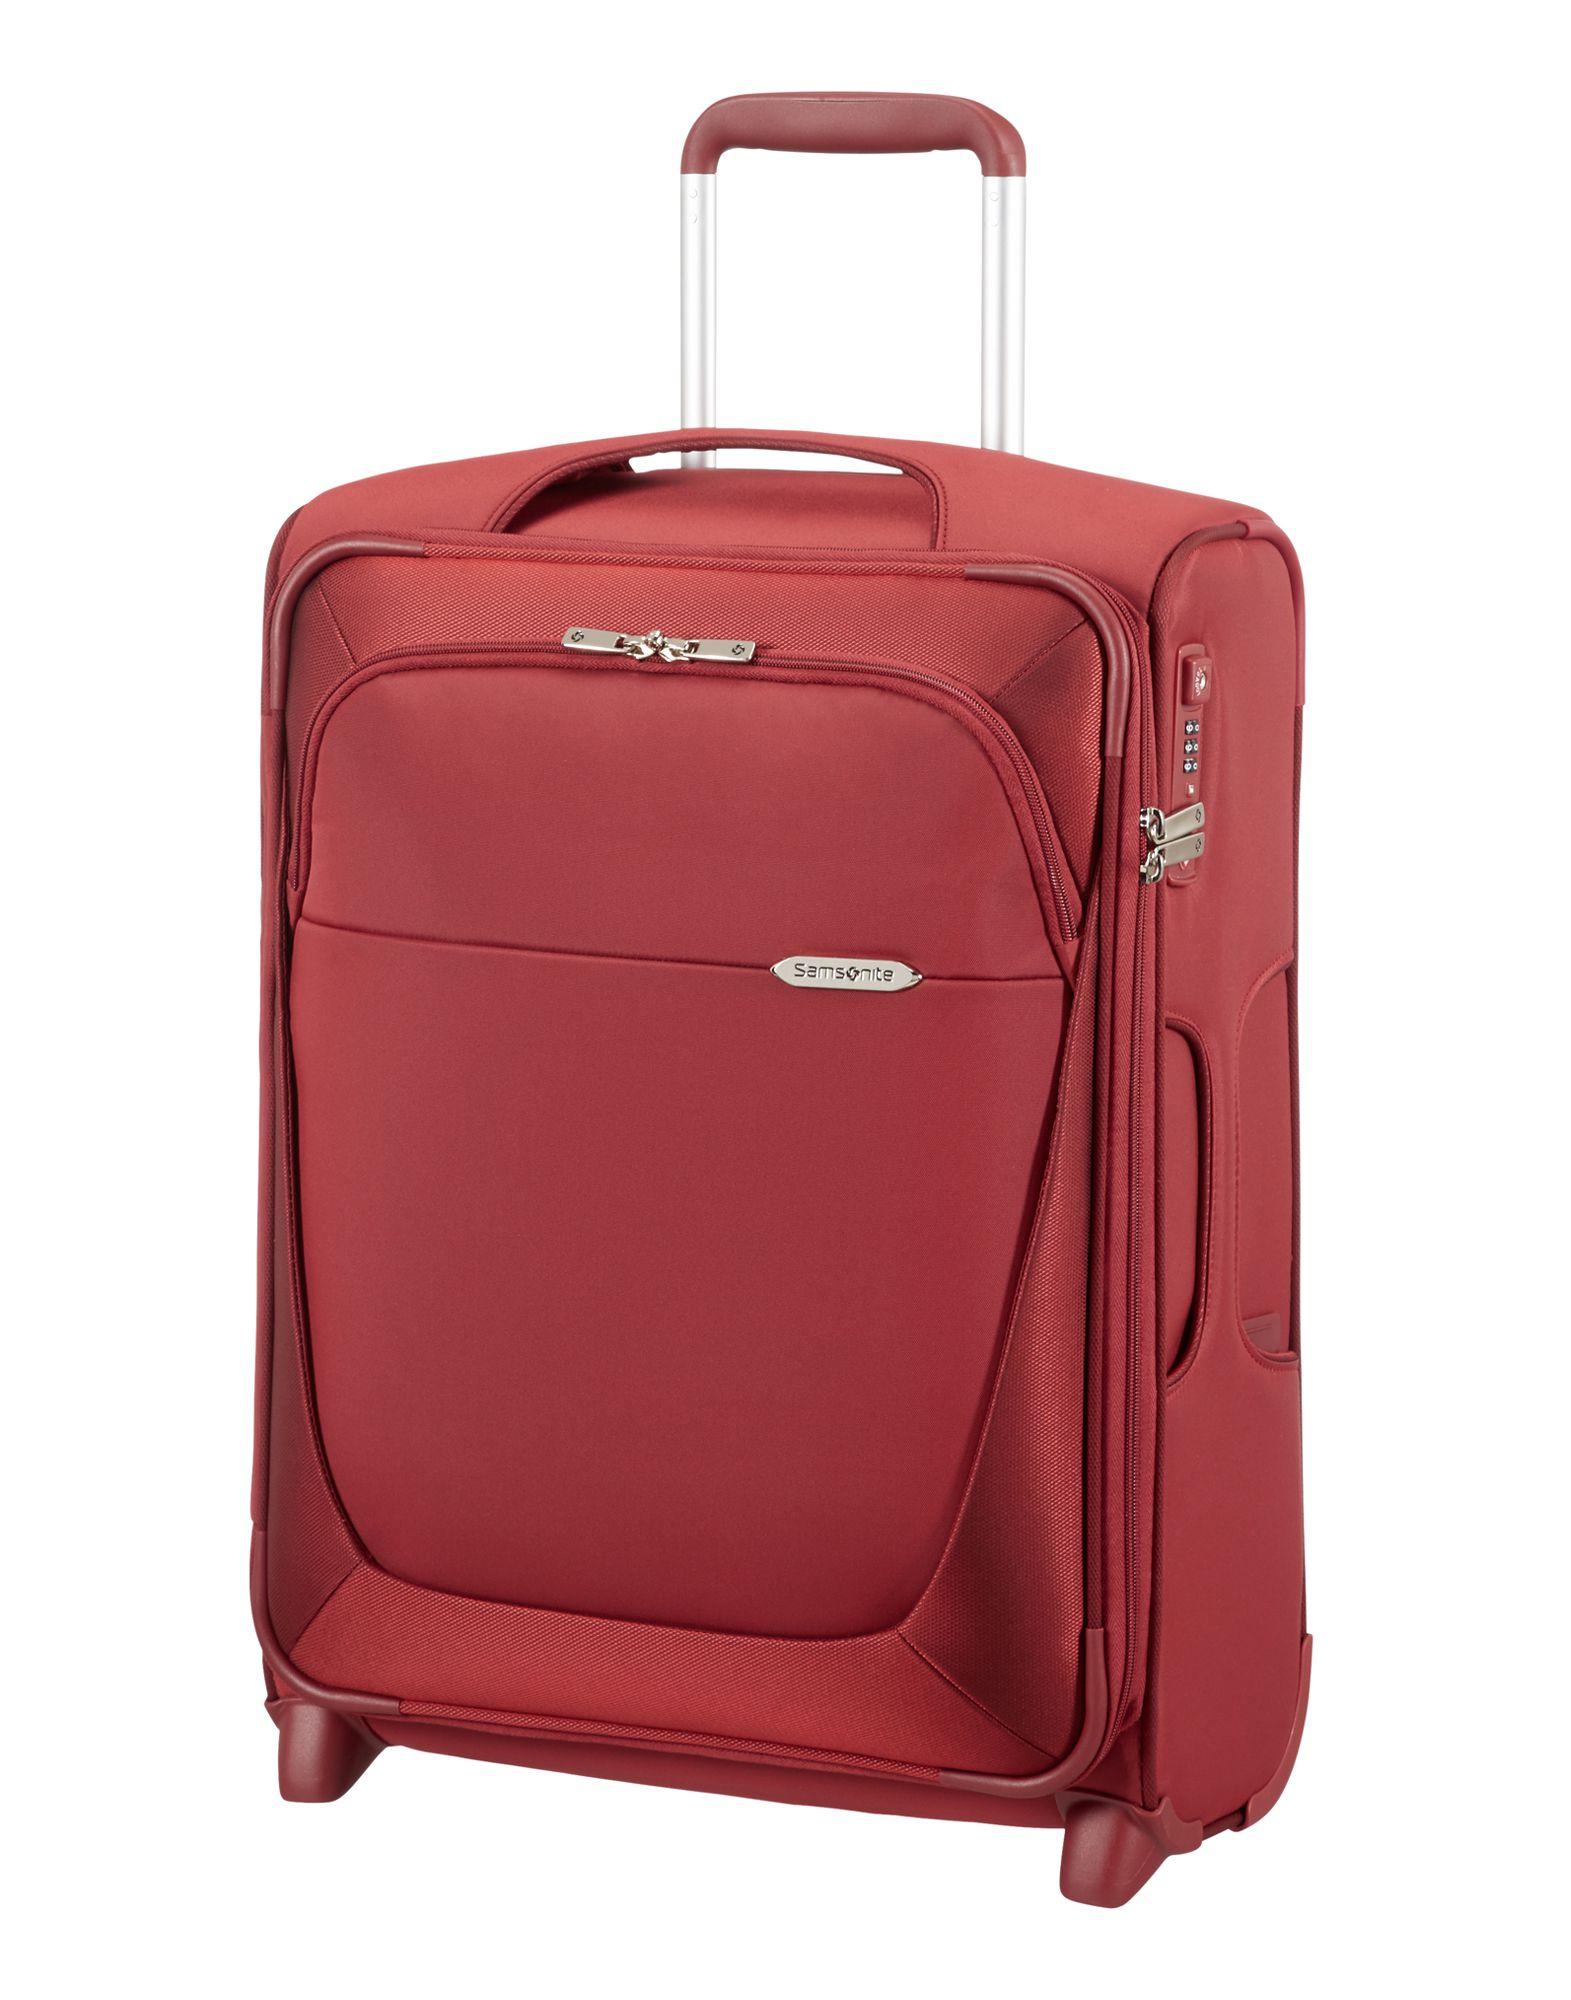 Samsonite Wheeled Luggage In Red Brick Red Lyst